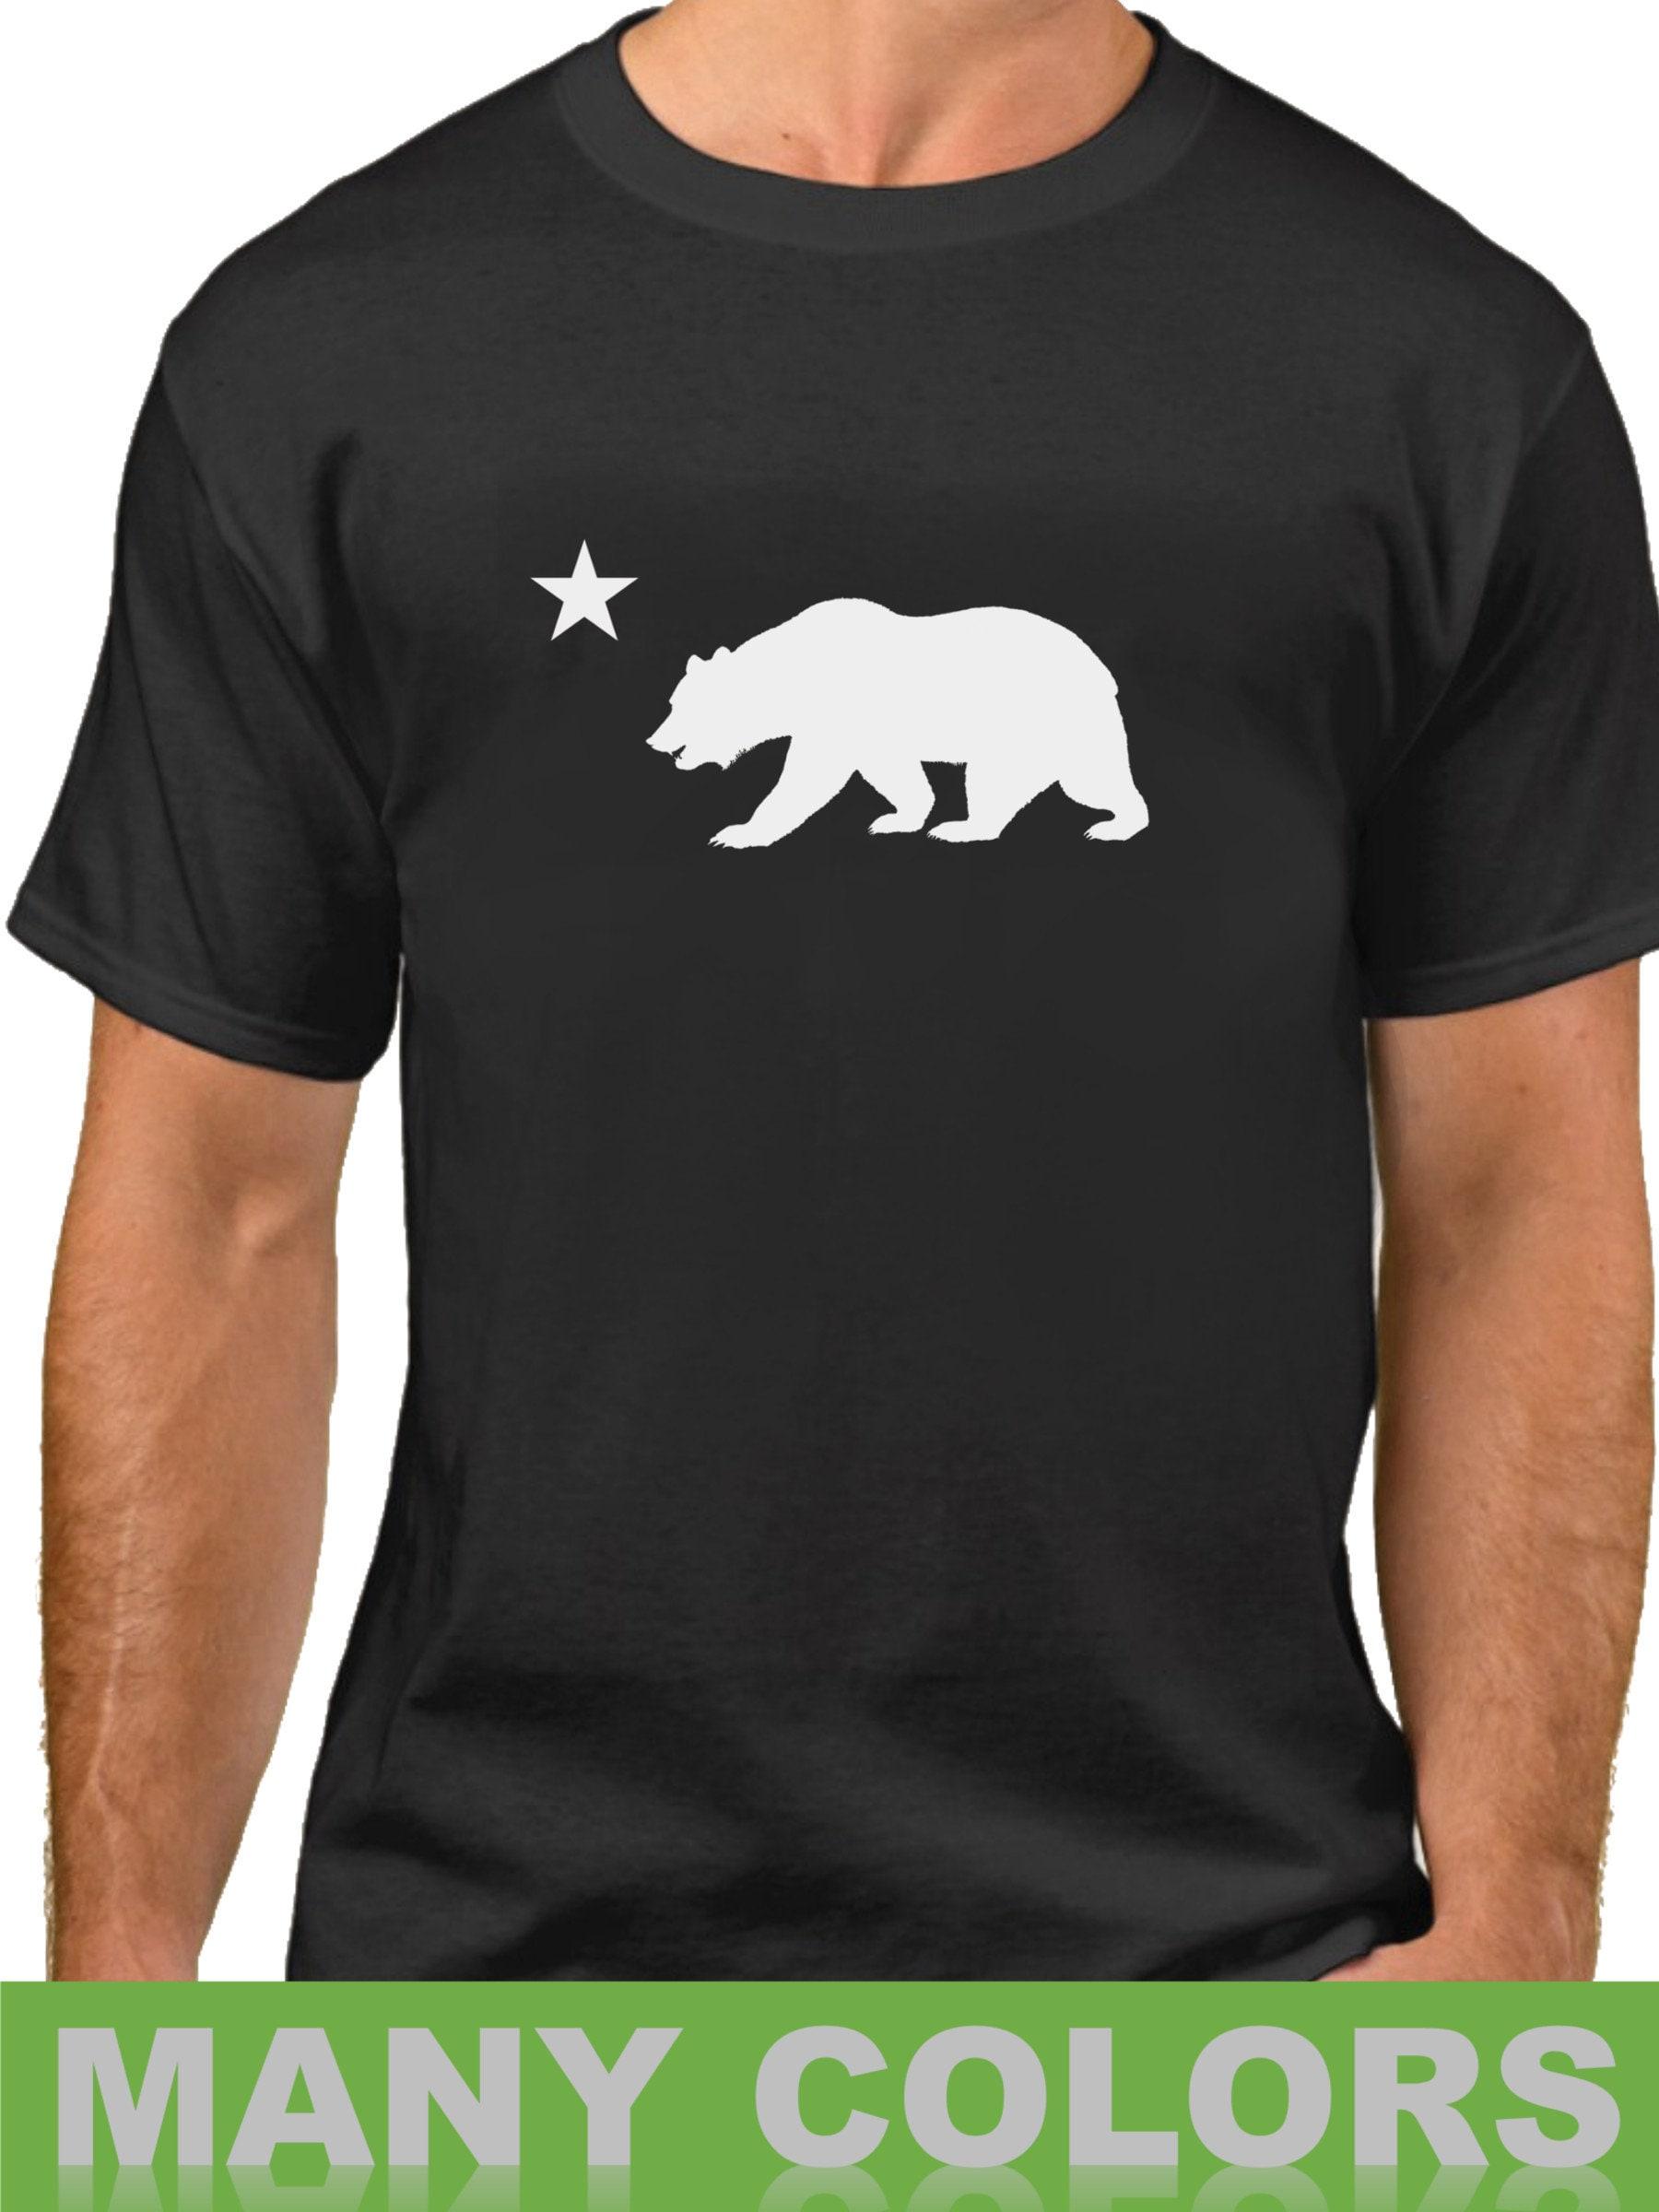 california republic shirt flag bear and star tee cali bear t